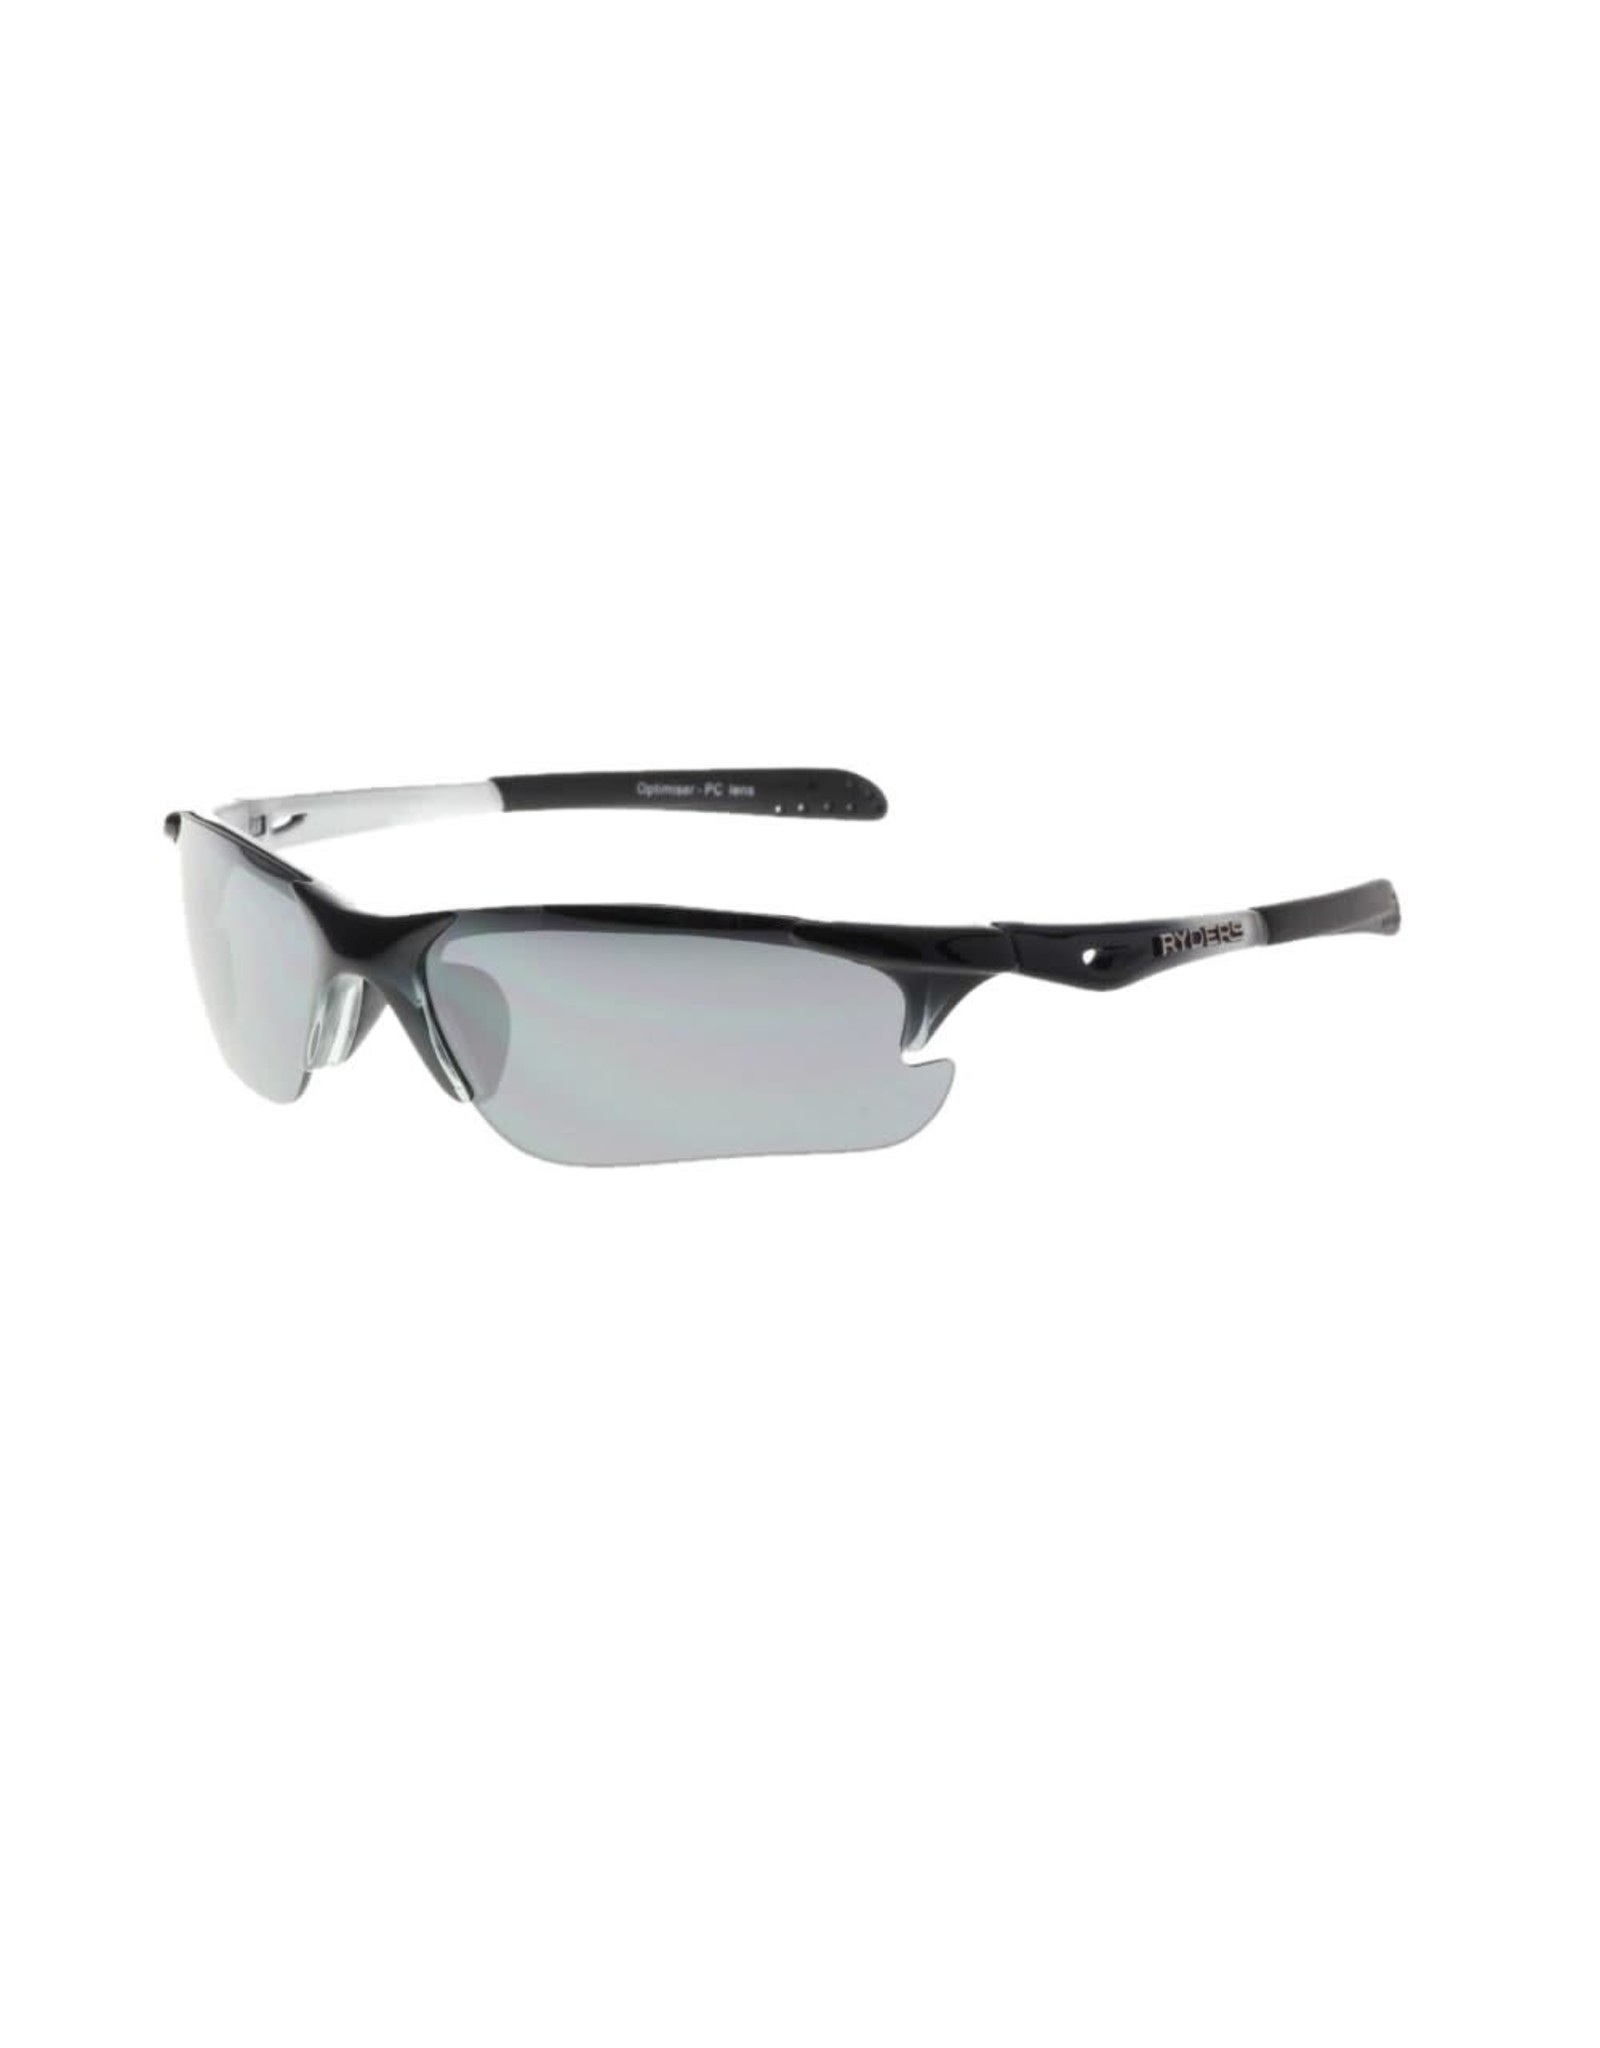 Ryders Optimiser Antifog Cycling Sunglasses